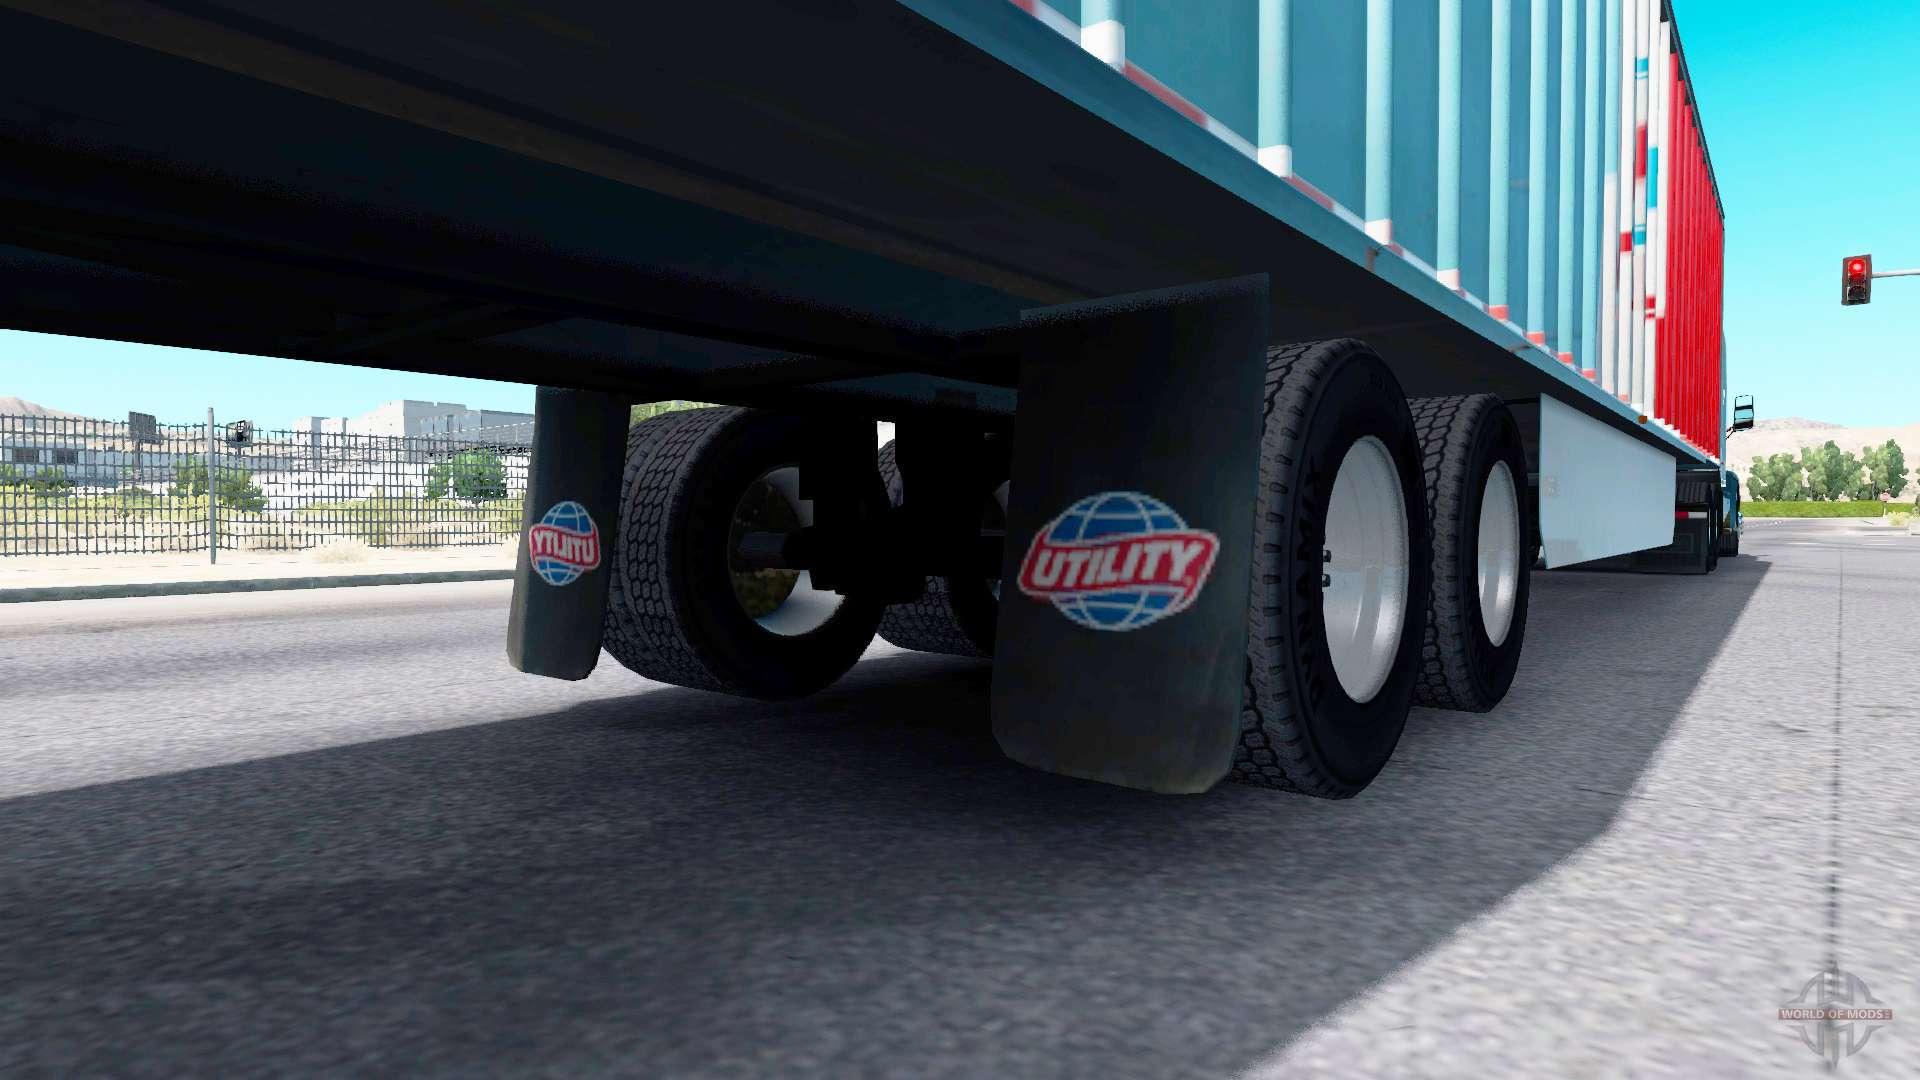 mercial truck mud flaps user manuals